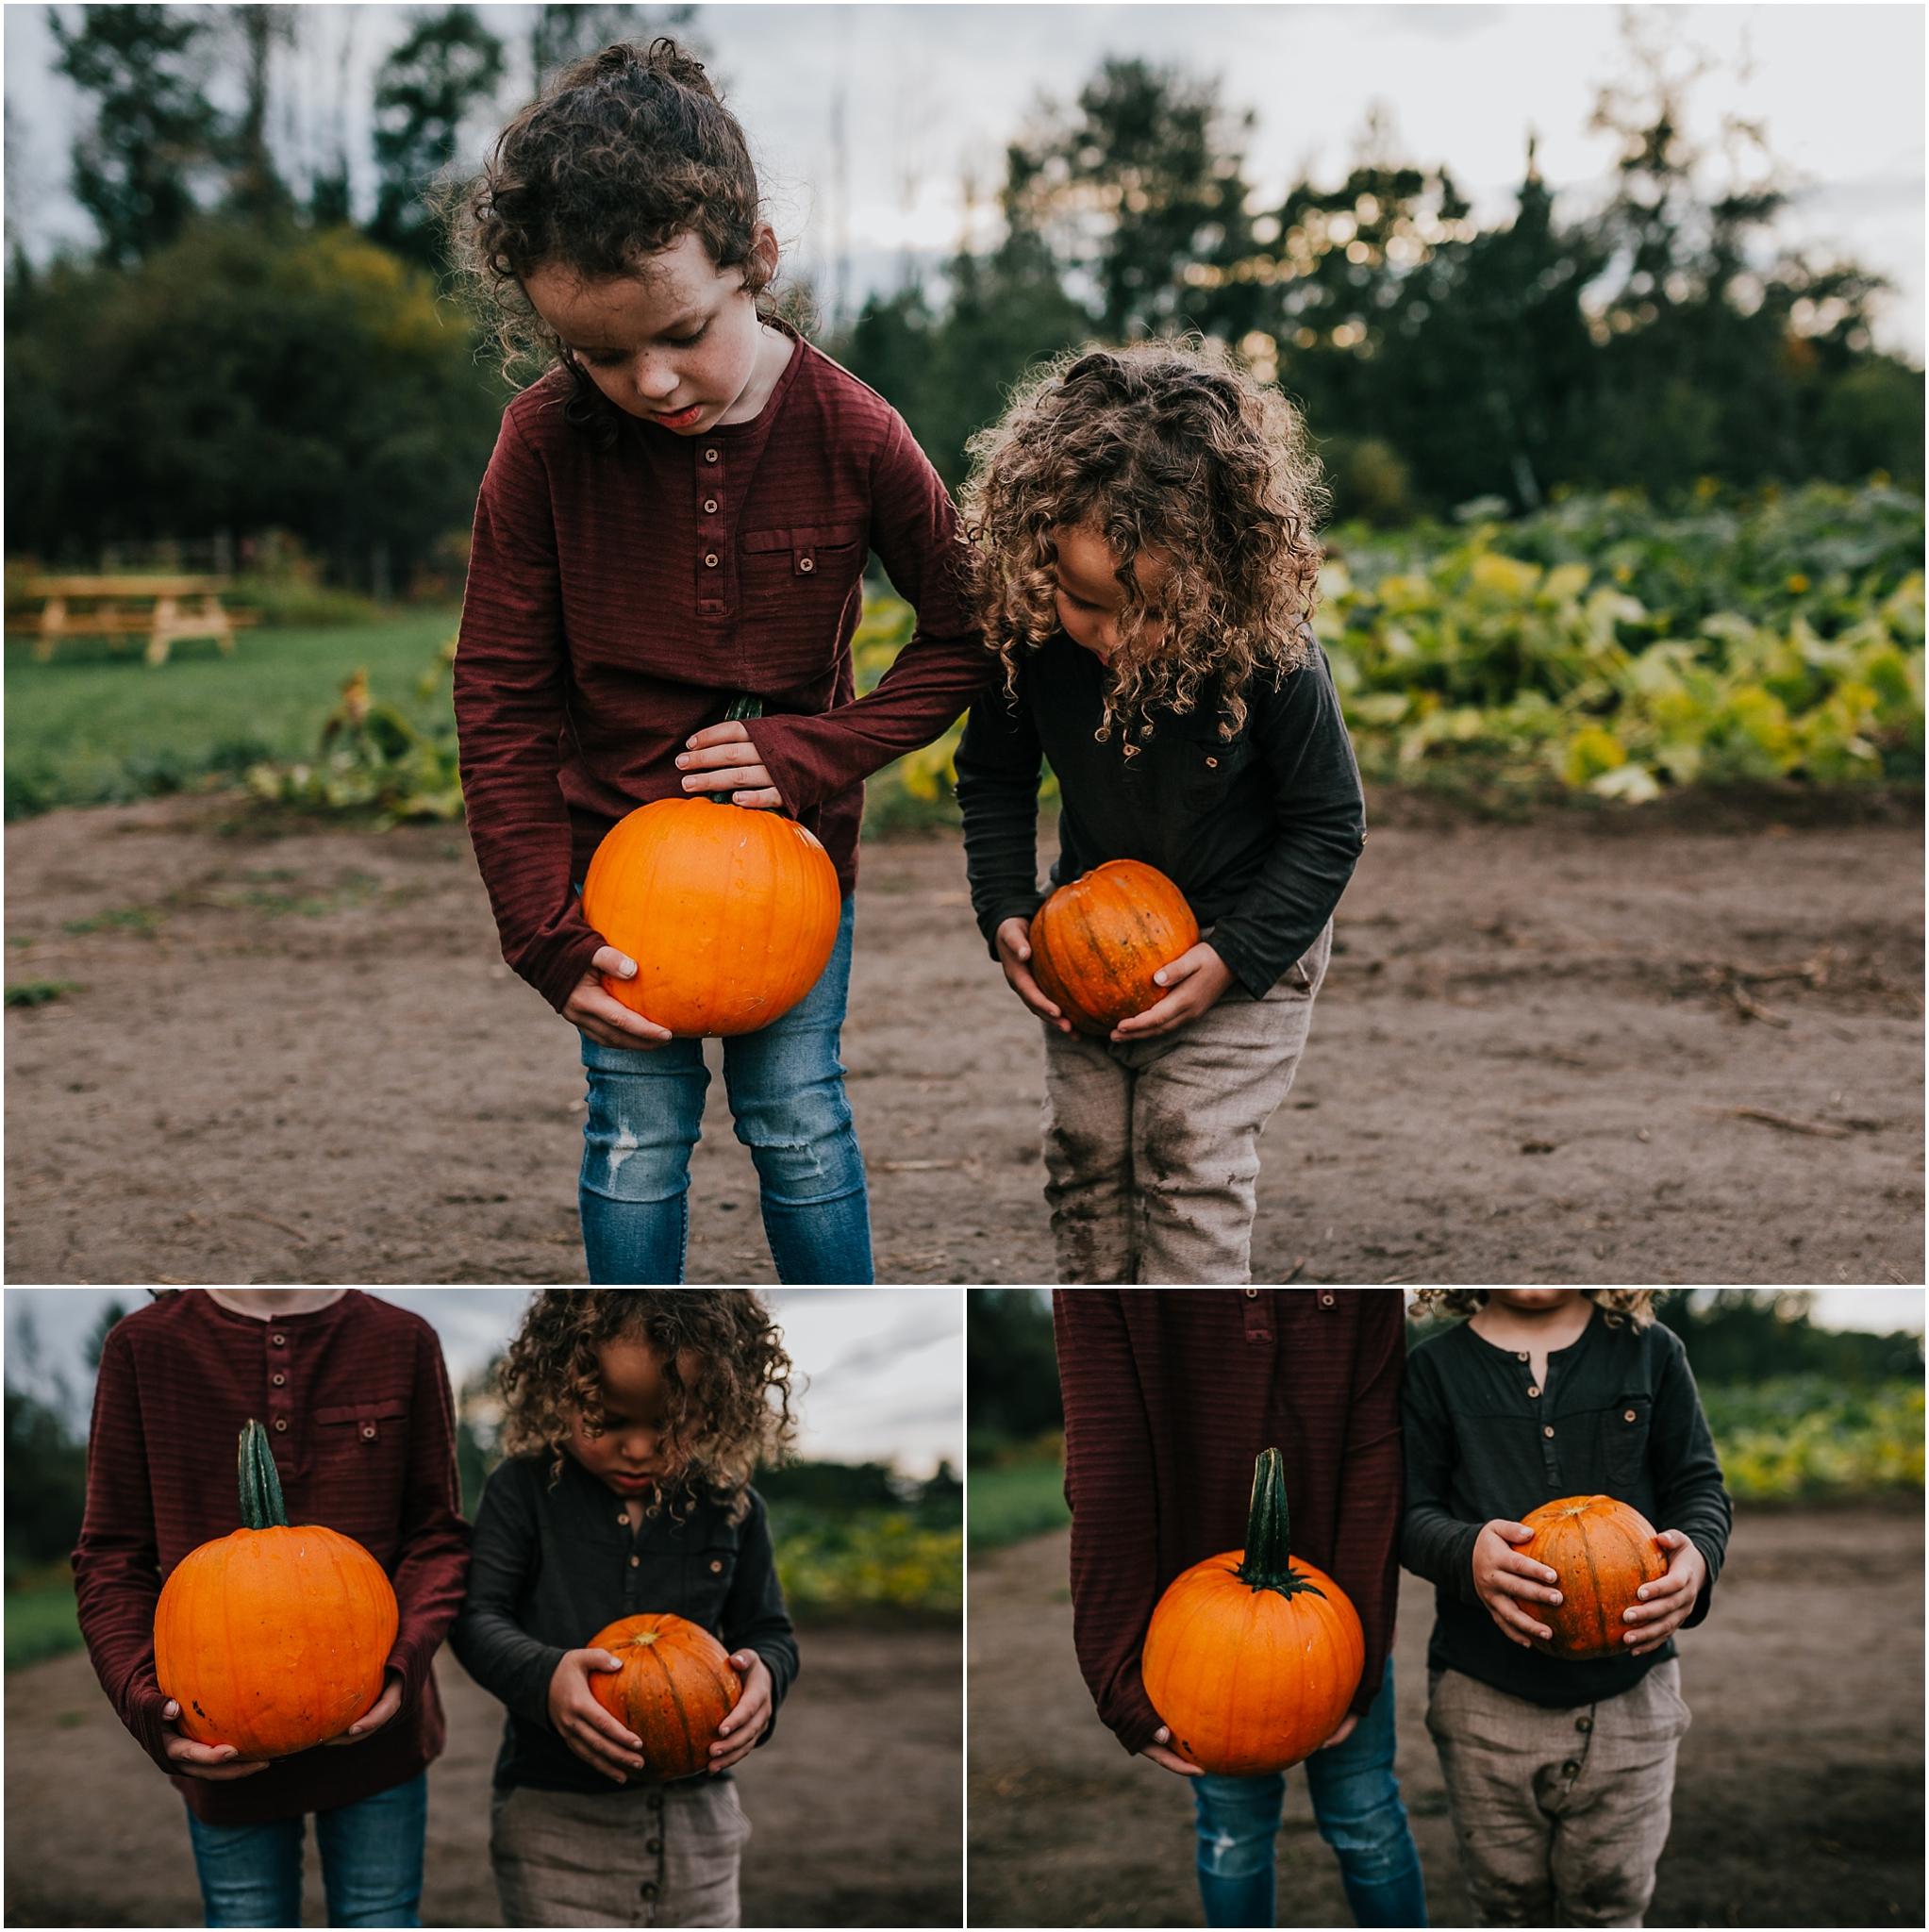 Edmonton Photographer - Edmonton Pumpkin Patch - Somerset Farms